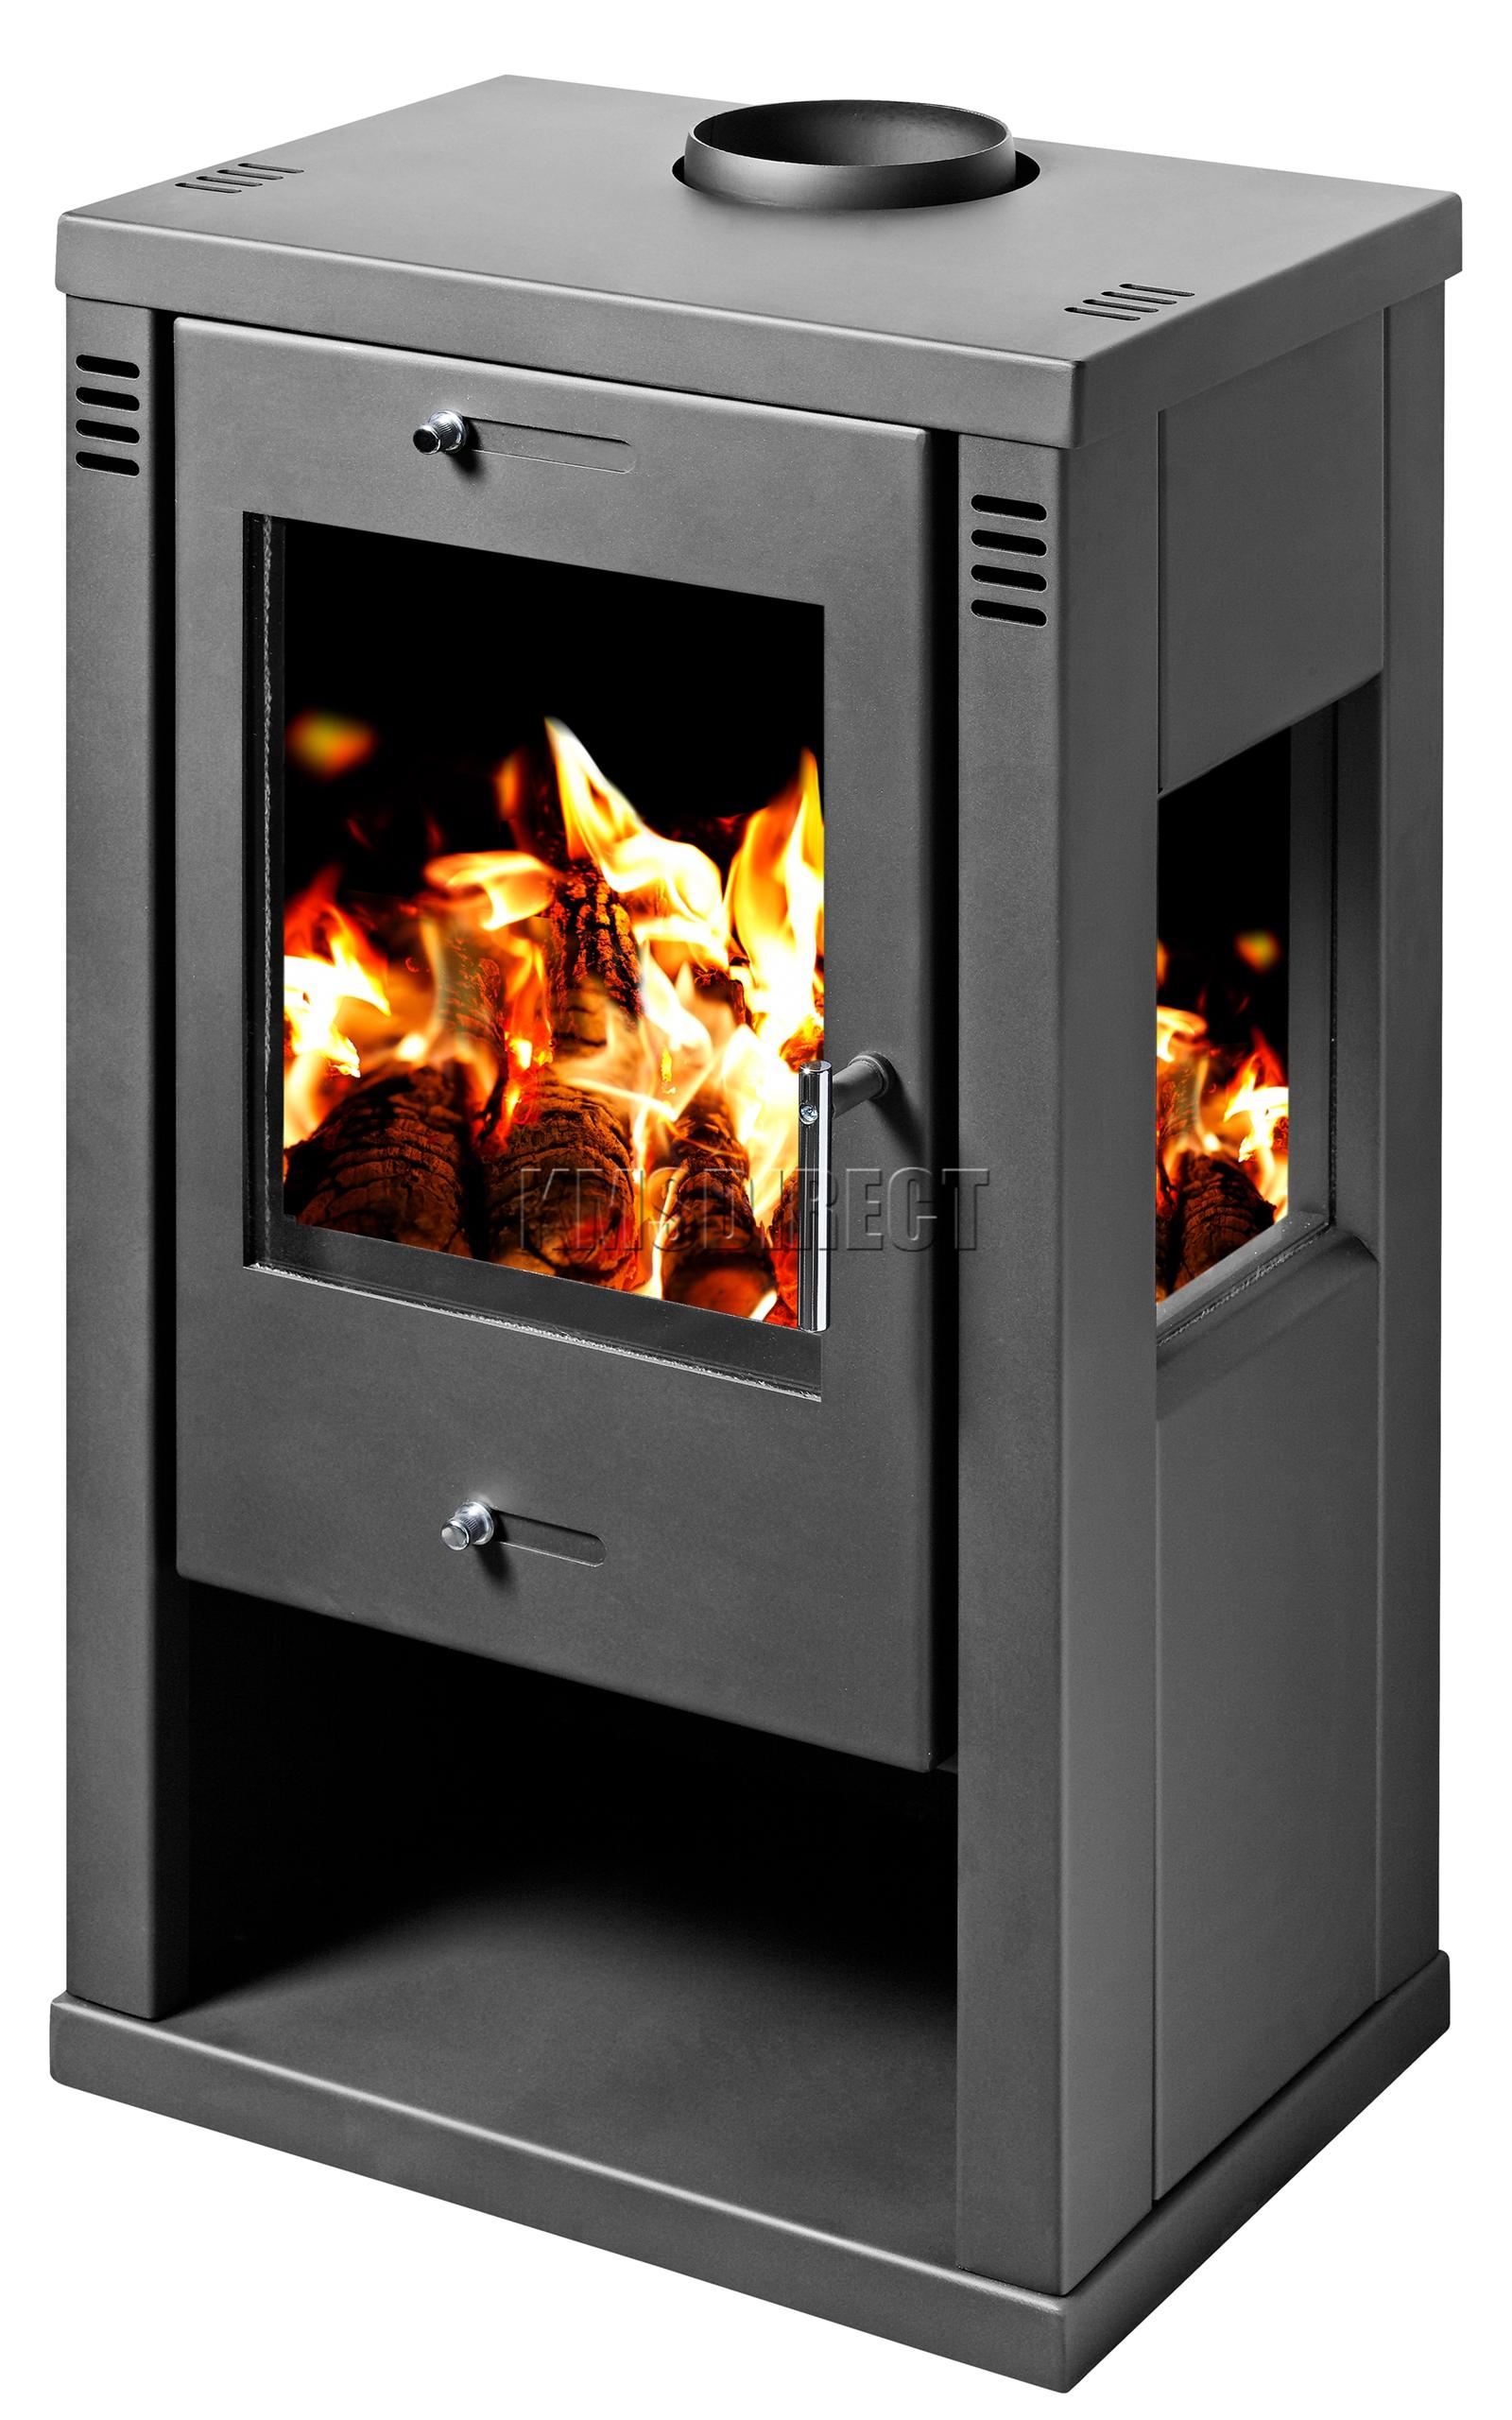 Tulin 7 5kw modern multi fuel wood burning log burner - Holzofen modern ...